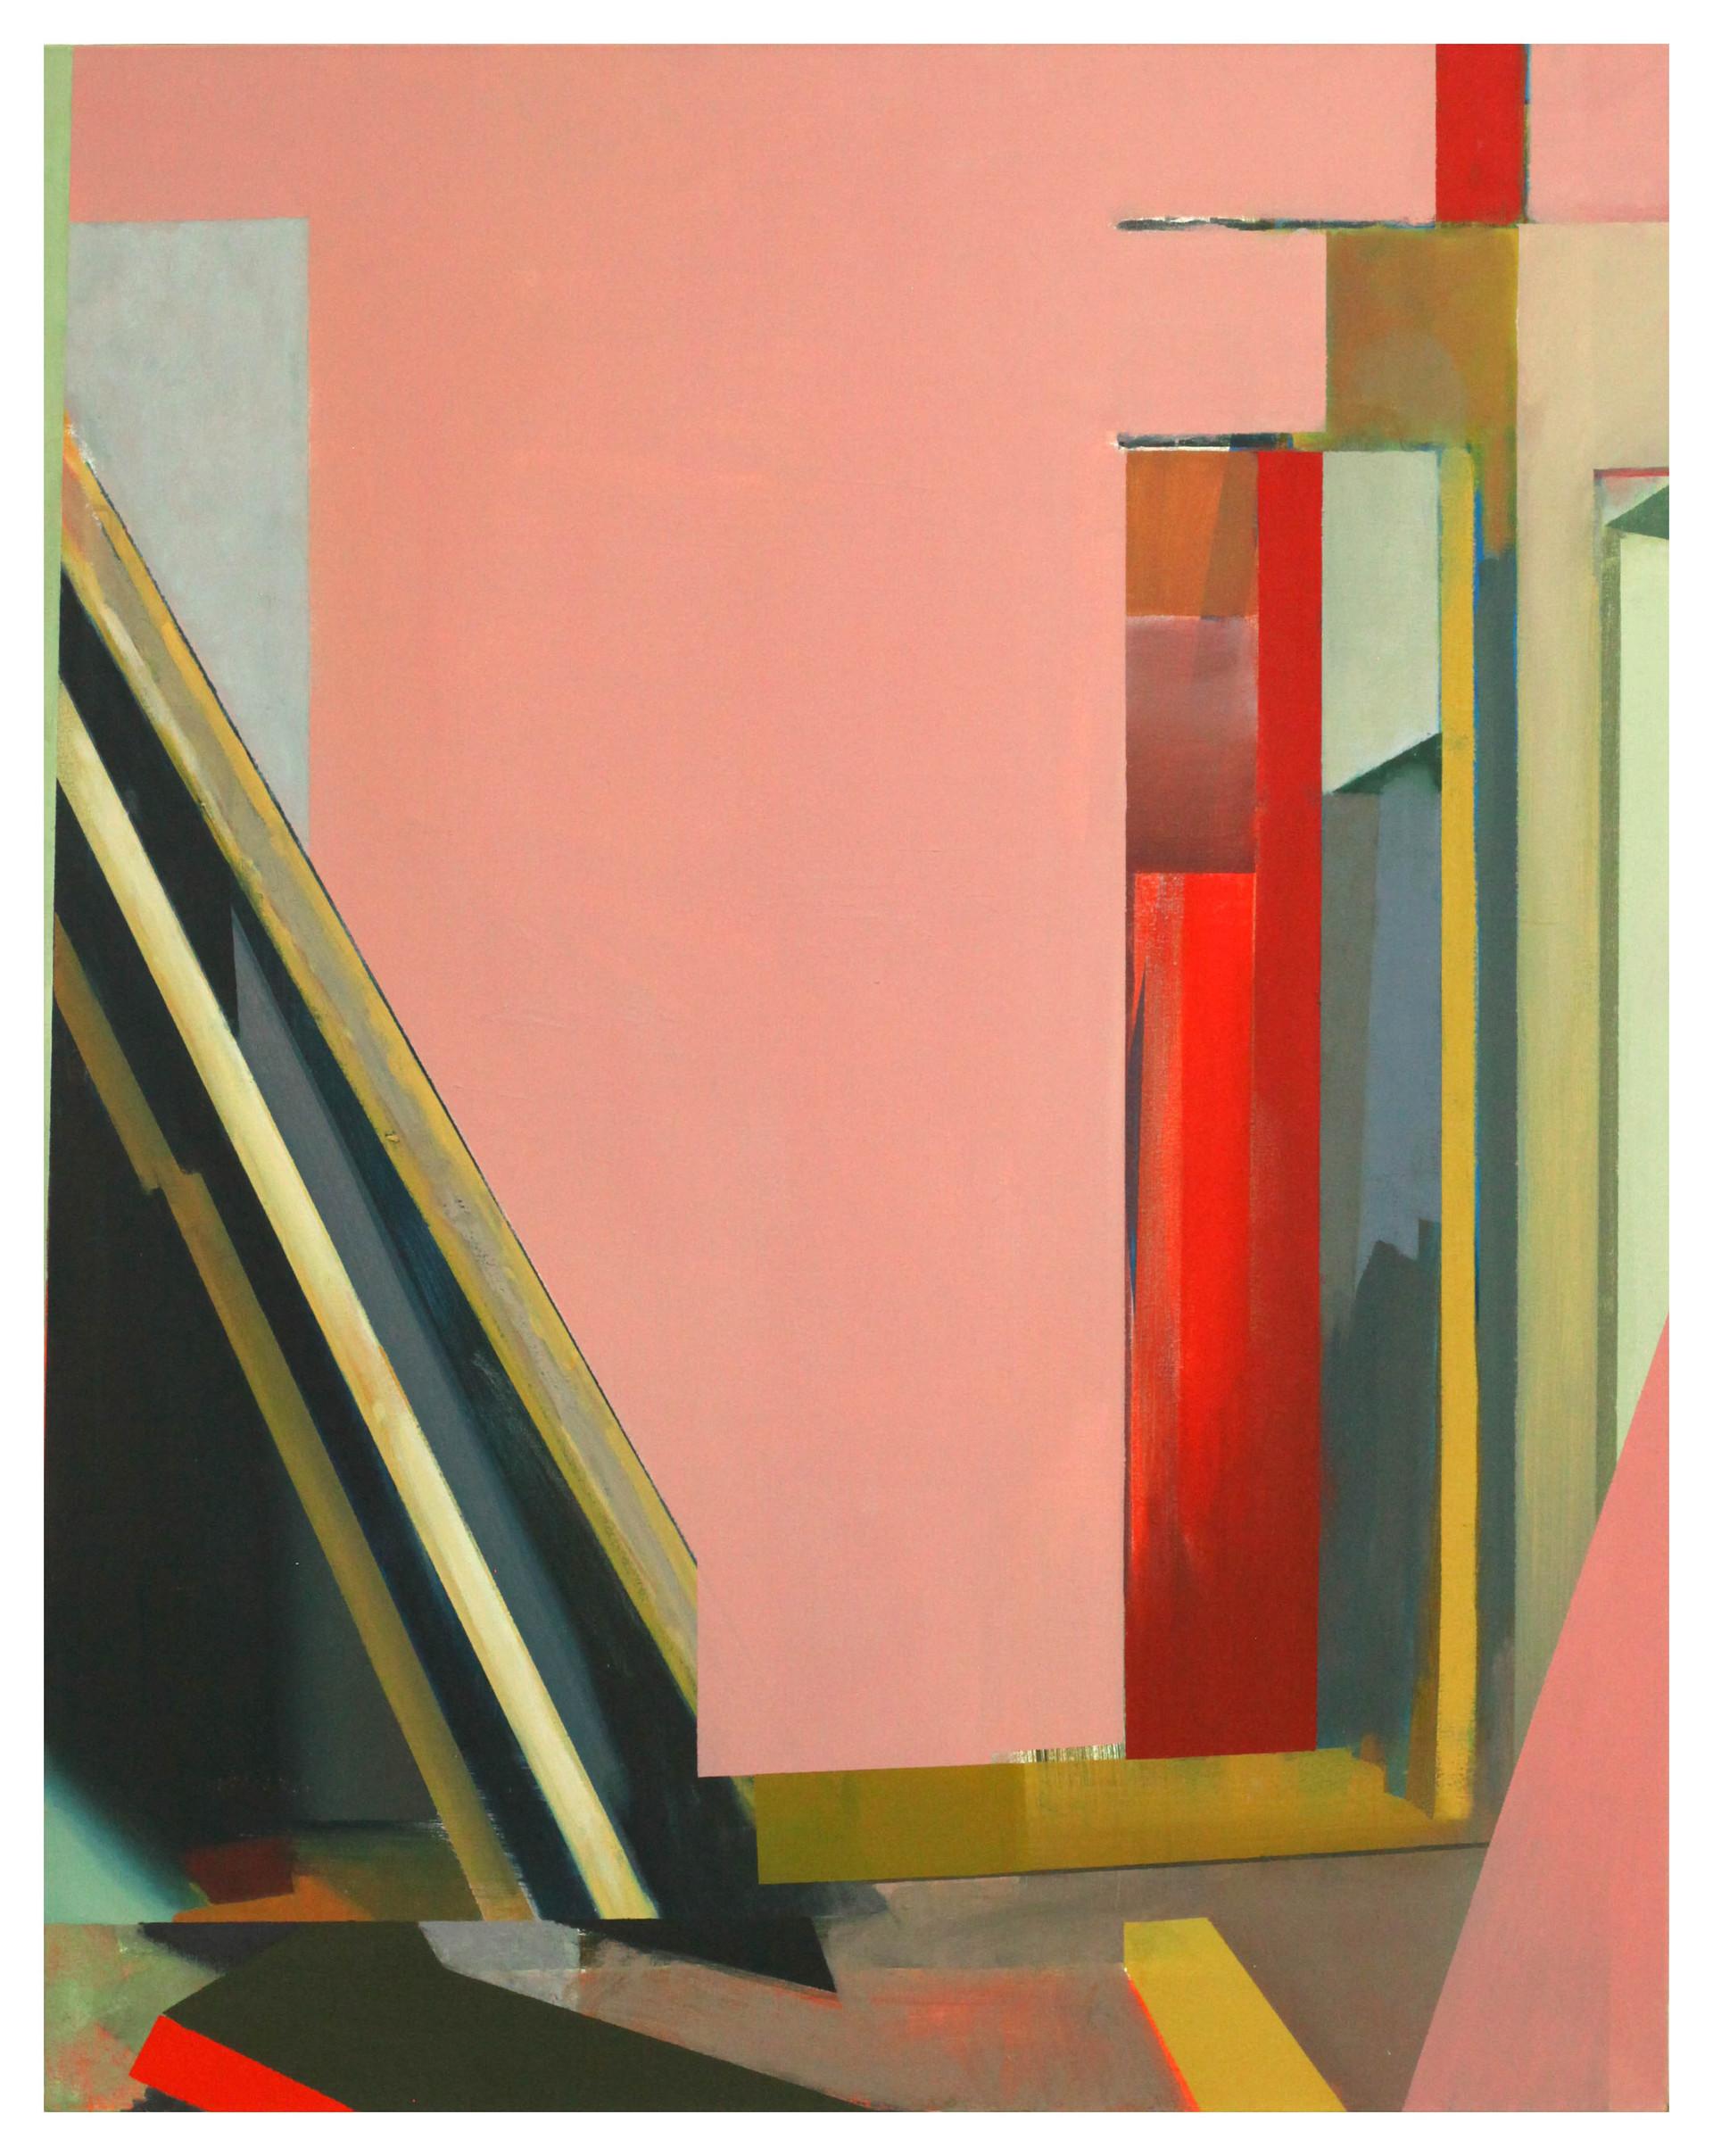 21-12-23-02, oil on canvas, 75 x 95 cm, 2019